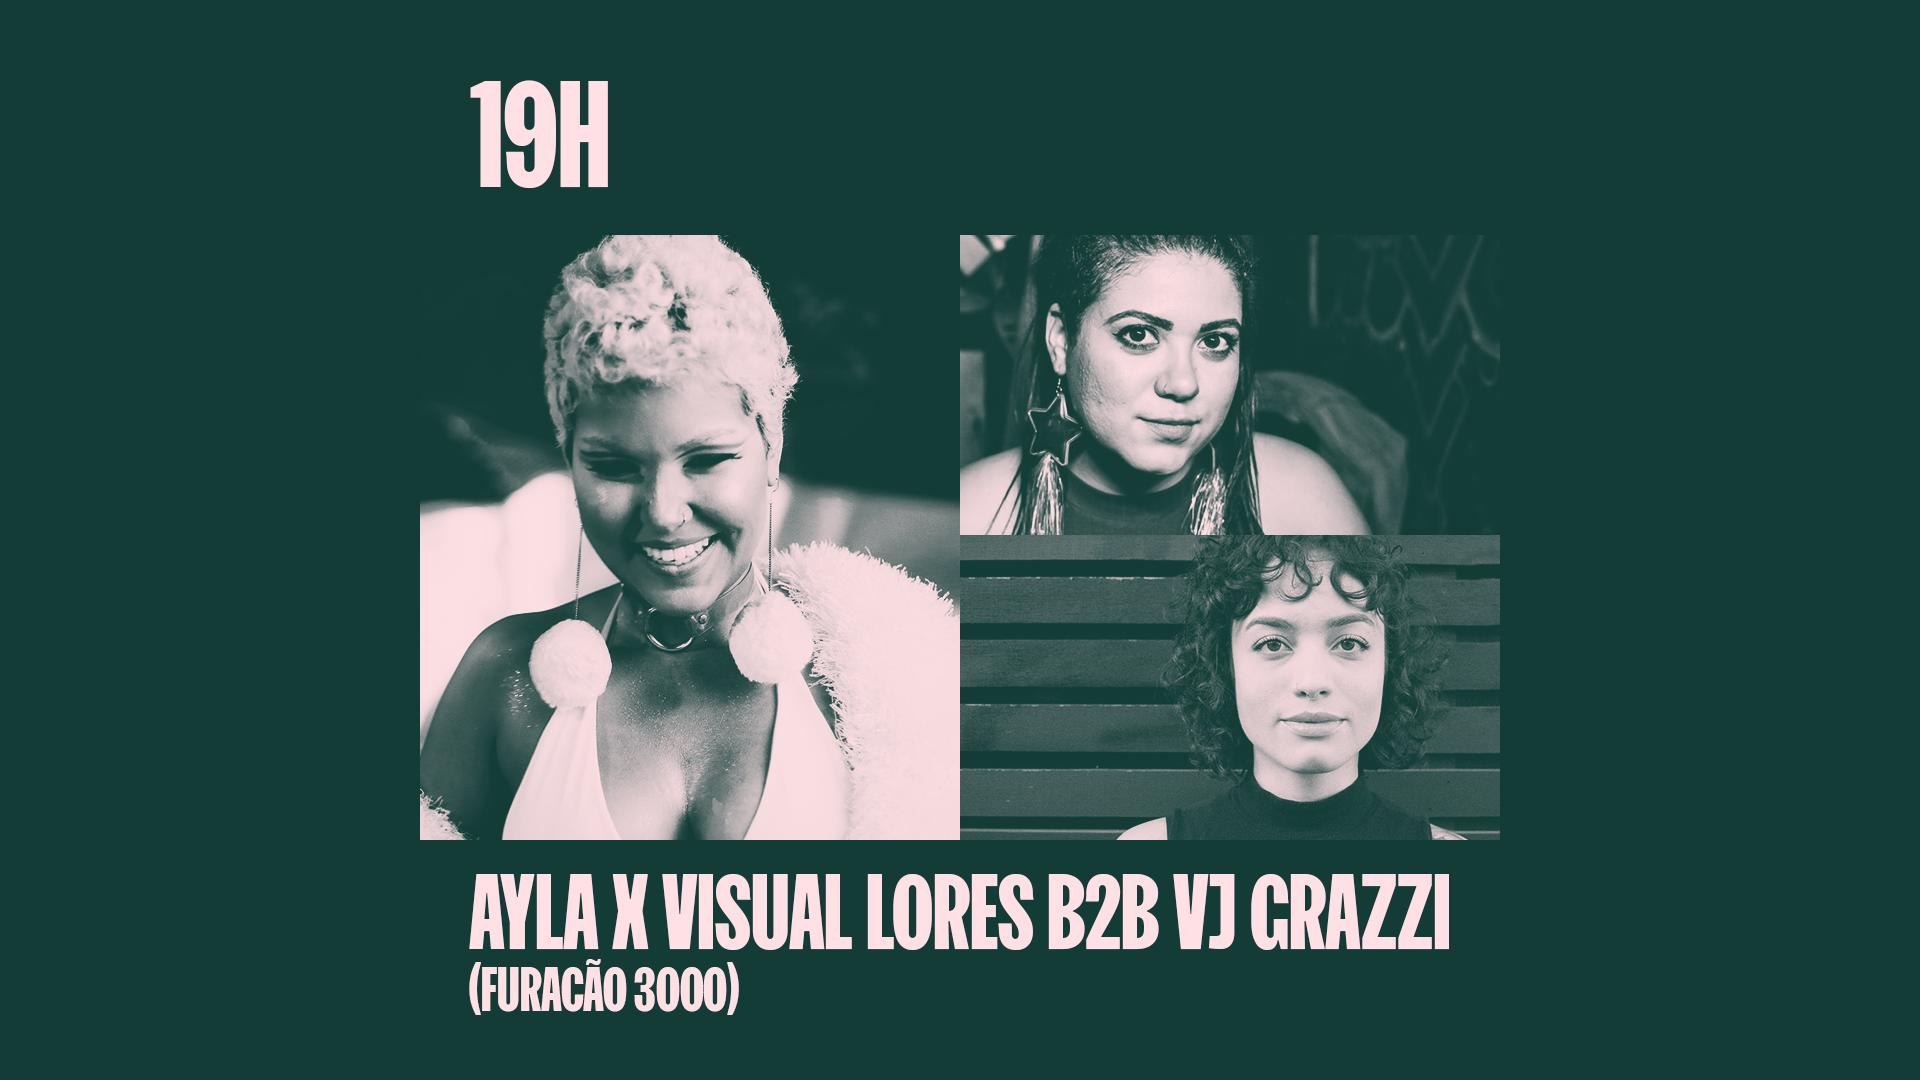 Ayla (Furacão 3000) - convidada pelo Beco  x Visual Lores b2b VJ Grazzi